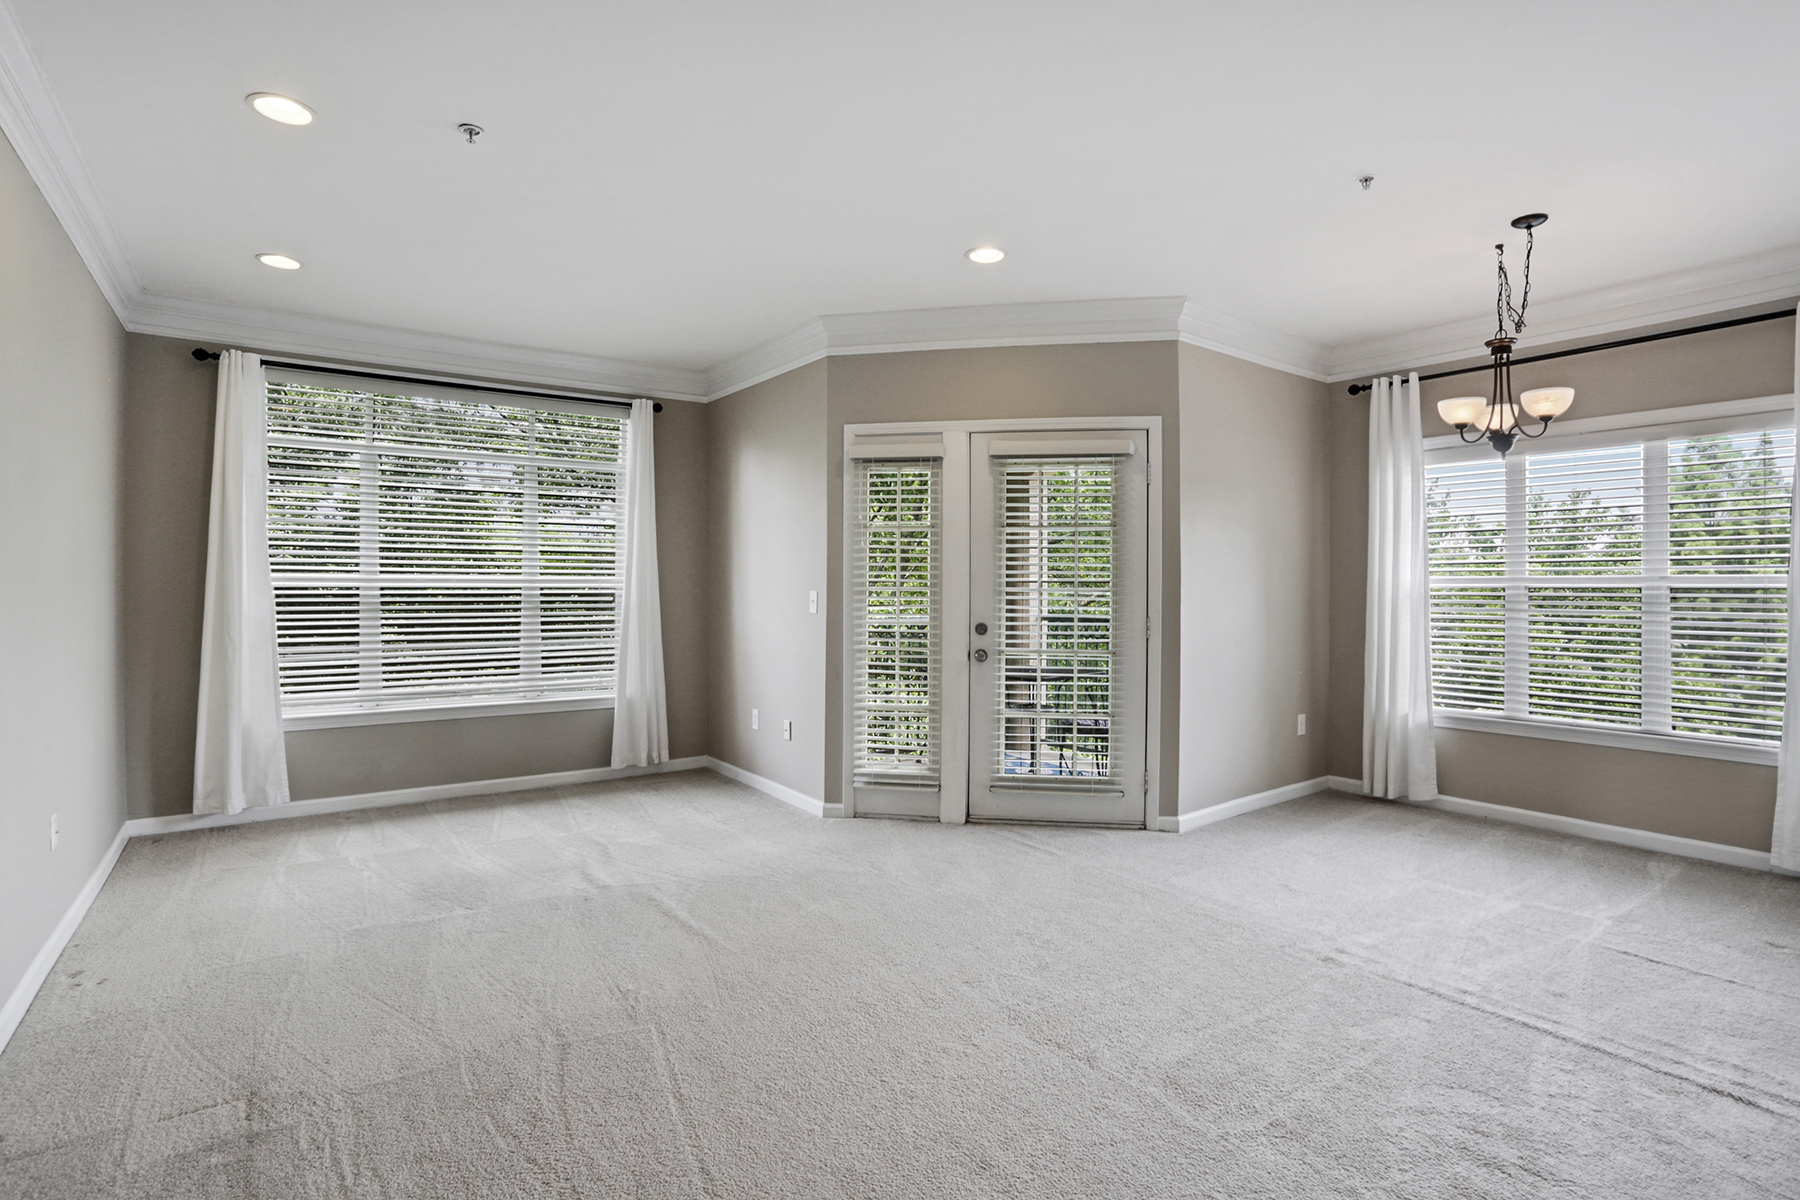 Condominium for Sale at Fantastic Opportunity in the Heart of Midtown 955 Juniper Street NE #4332 Atlanta, Georgia 30309 United States